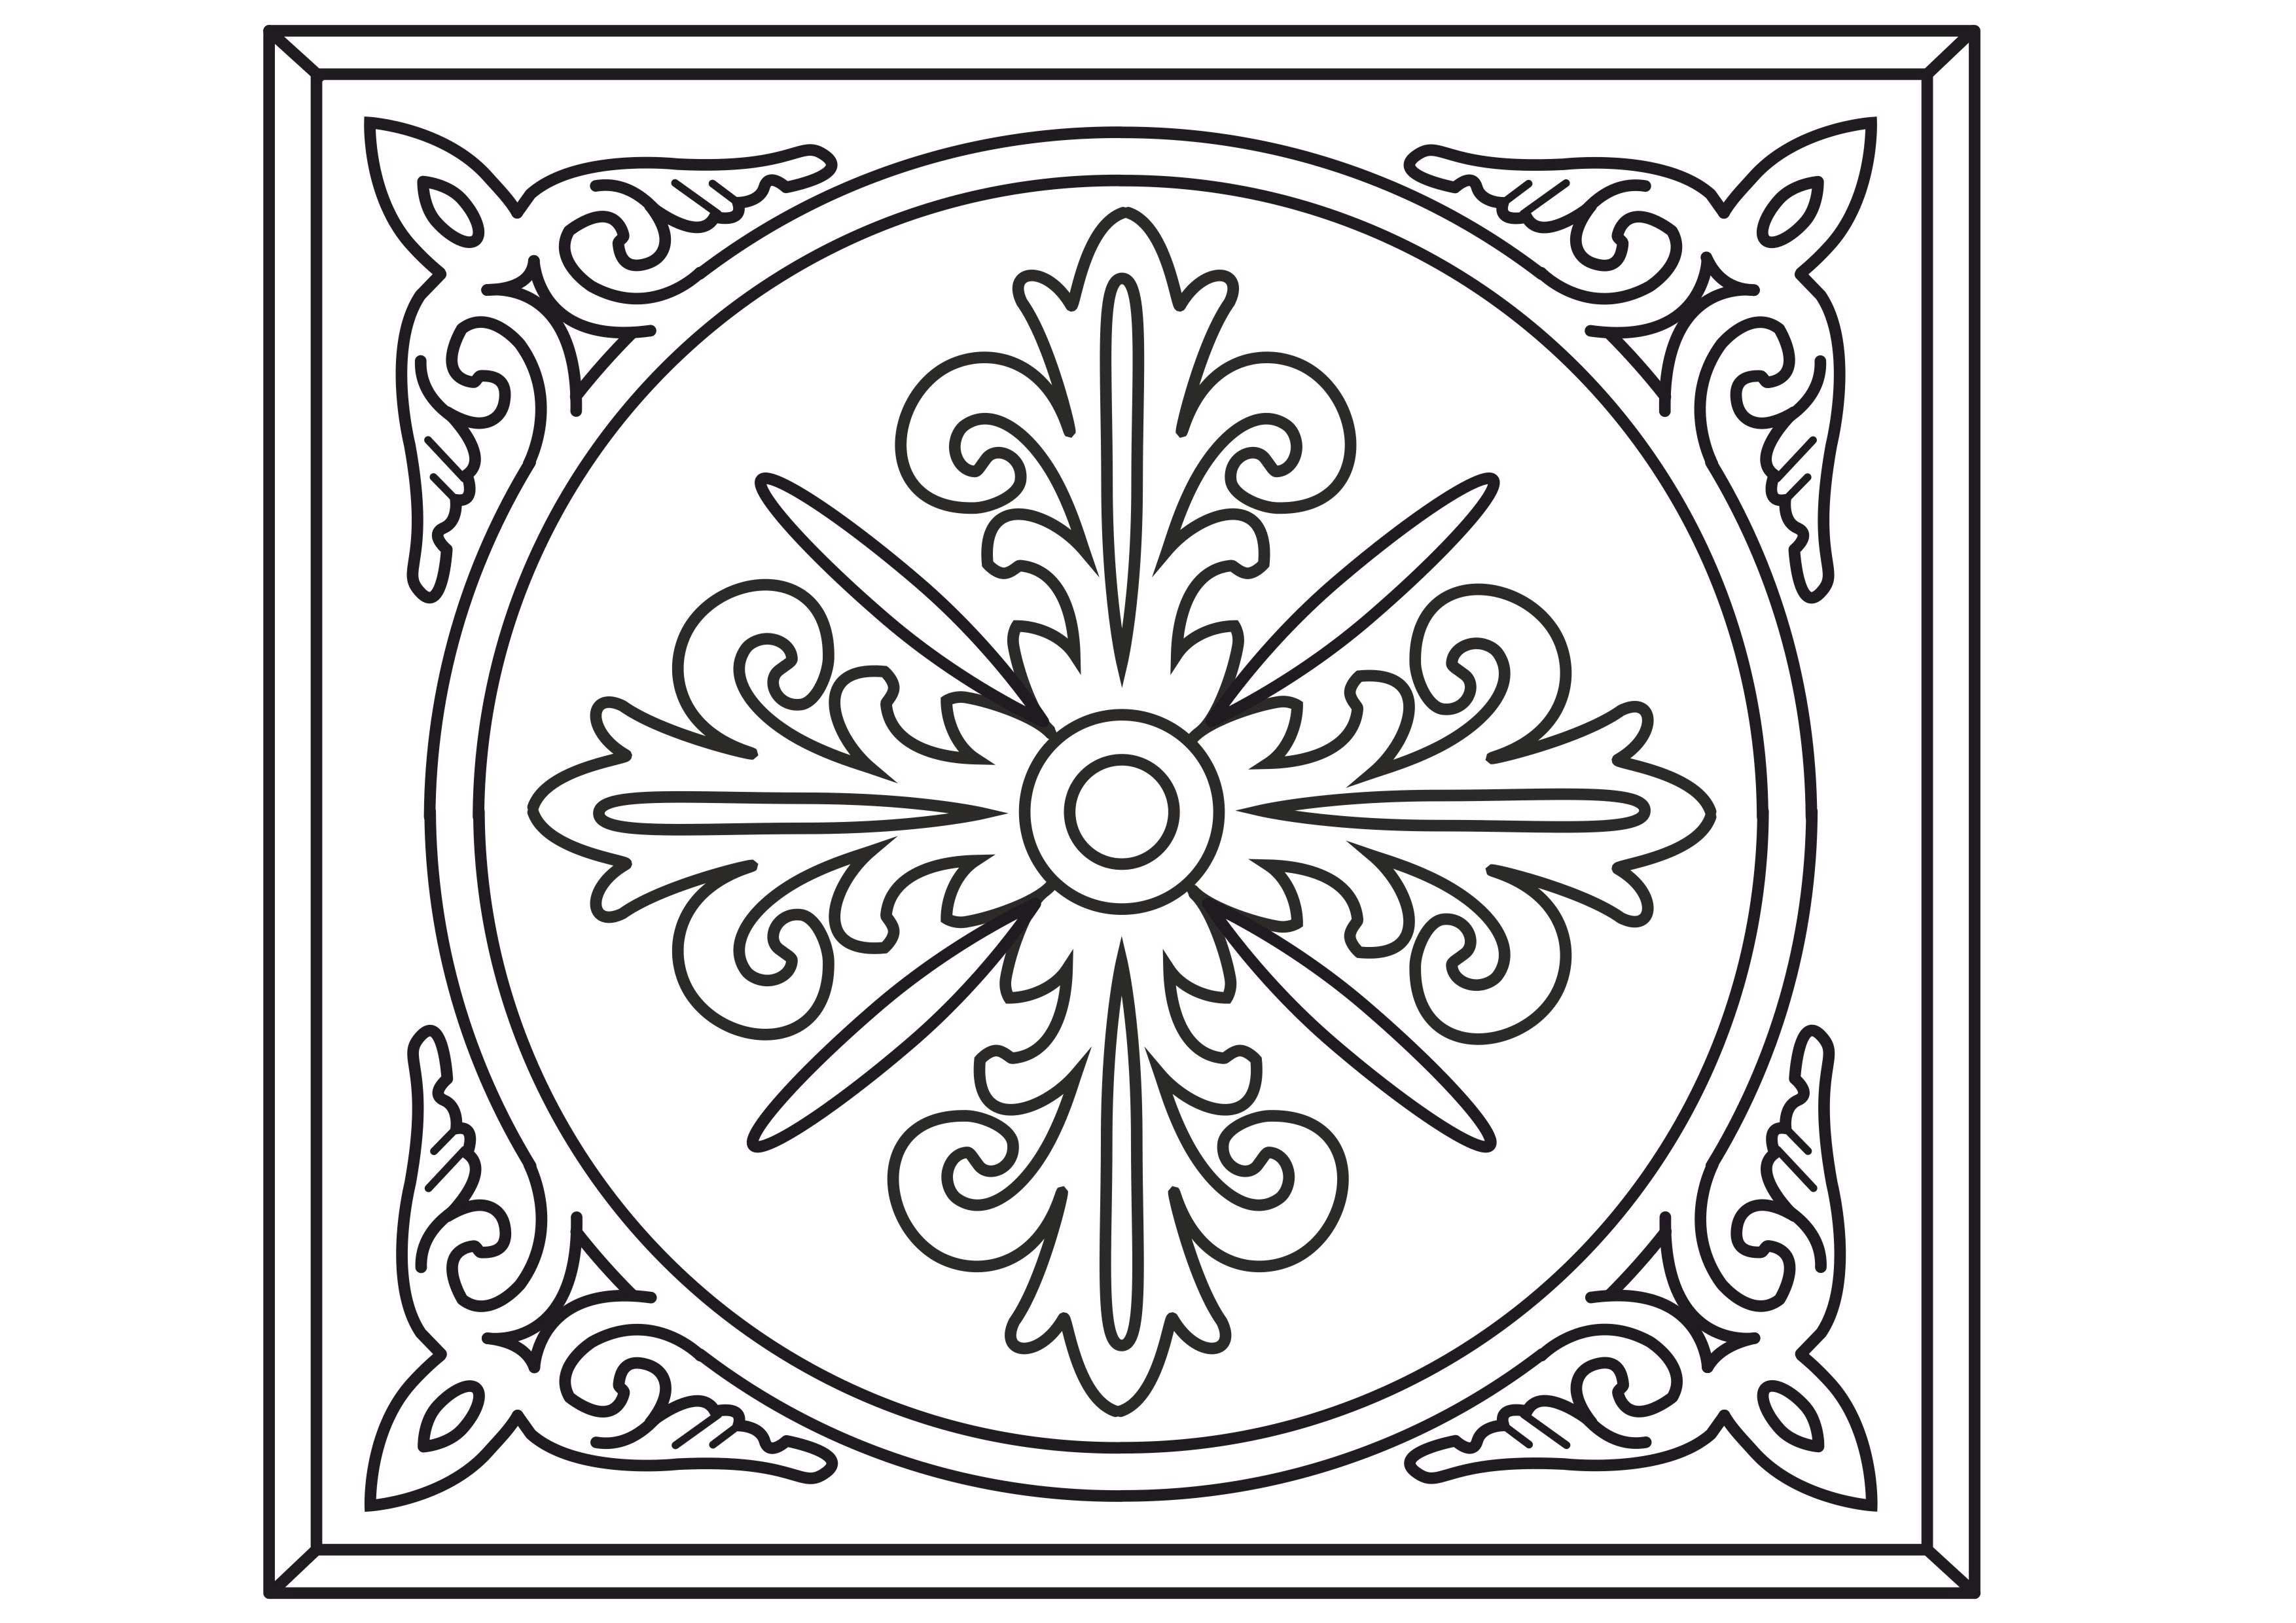 Image: Coptic Cross 22